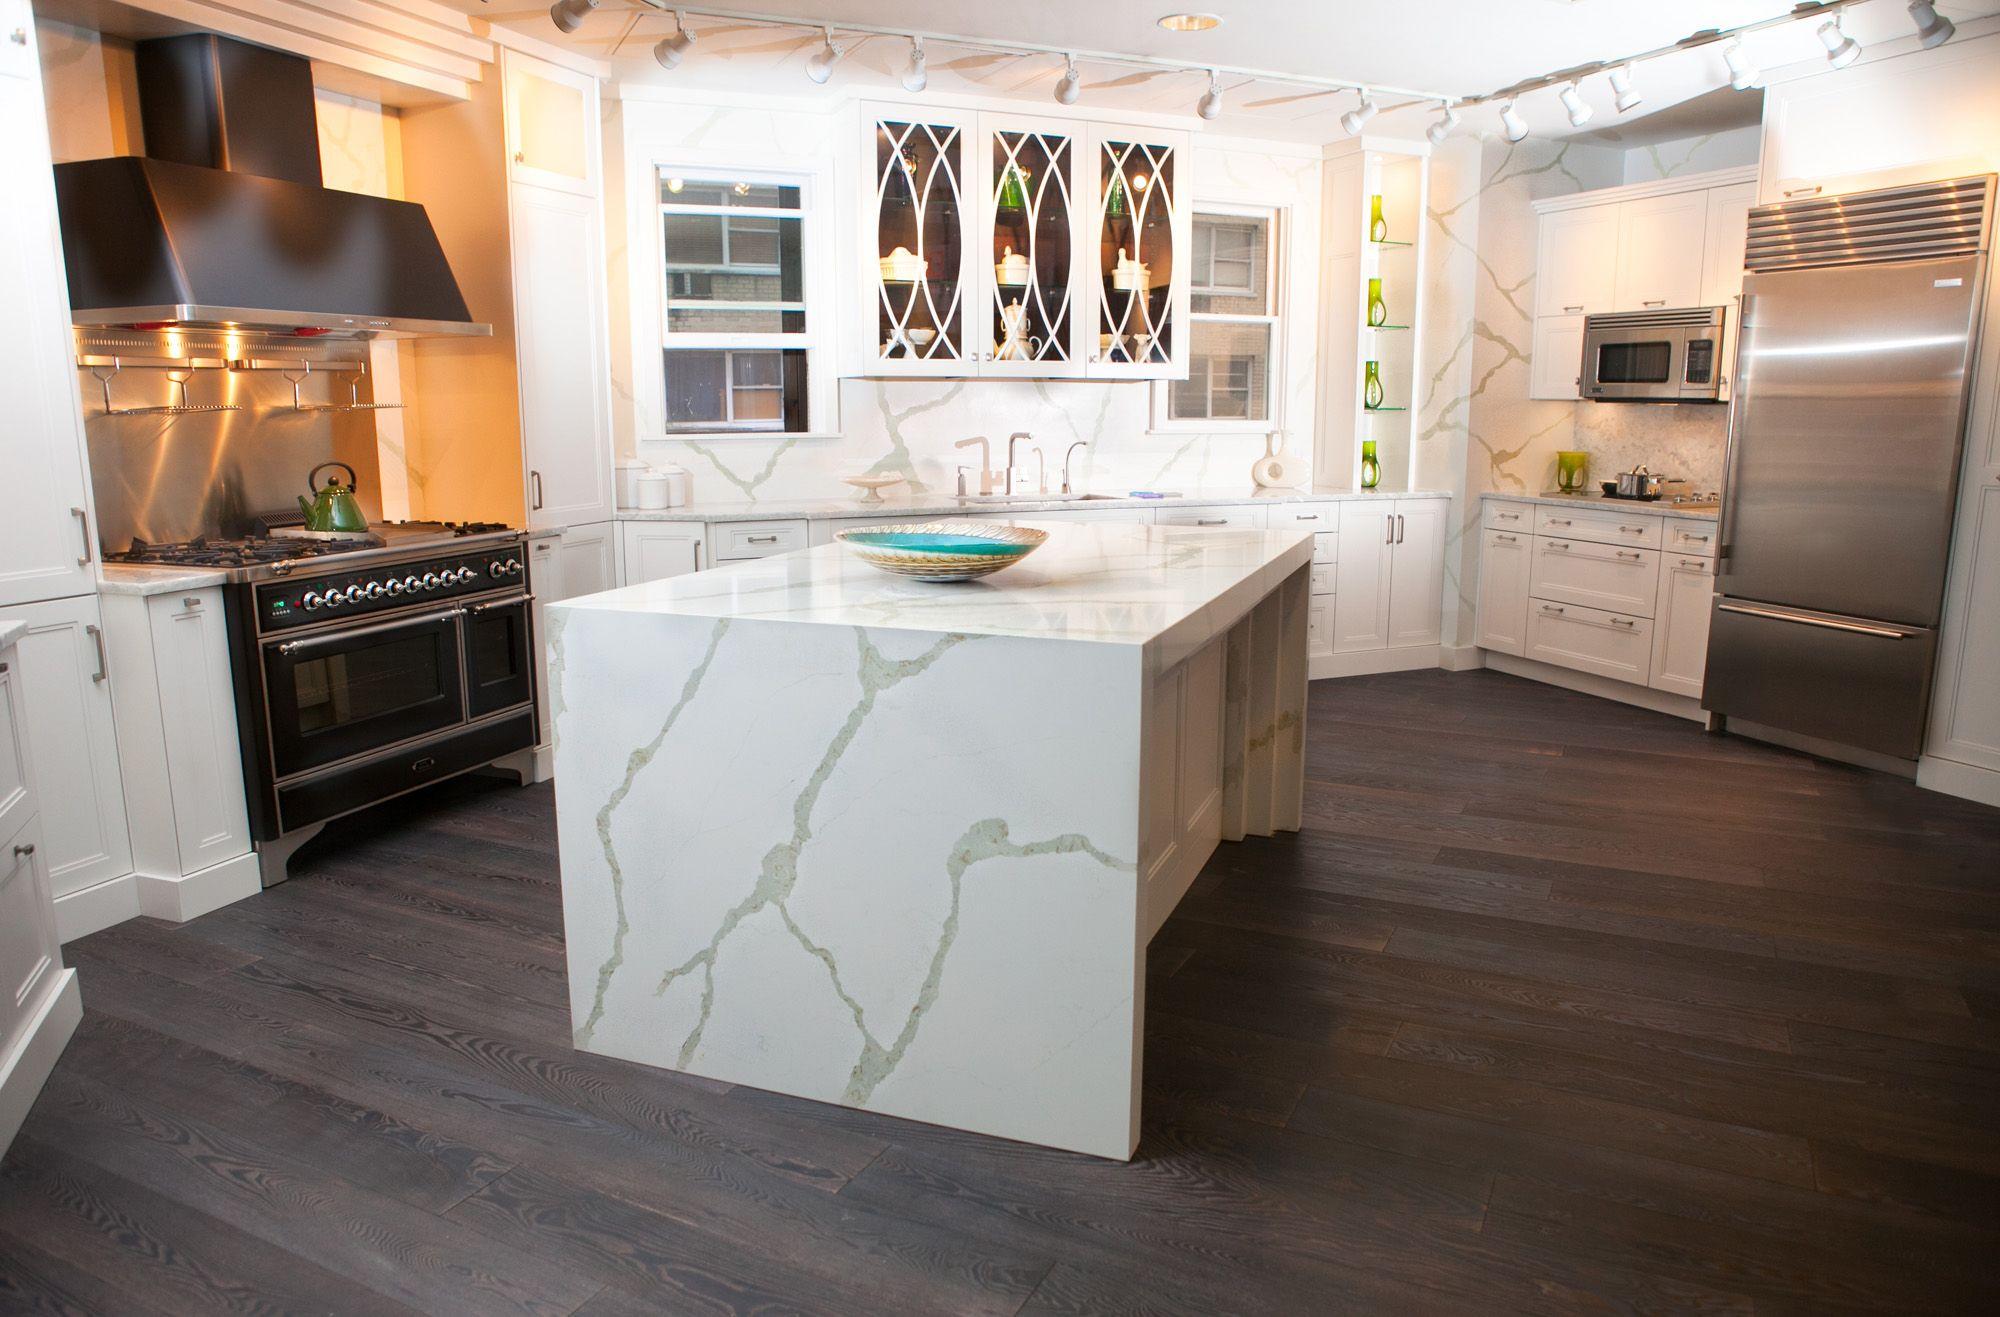 Best Bq8270 Calacatta Vicostone Quartz Countertops 400 x 300